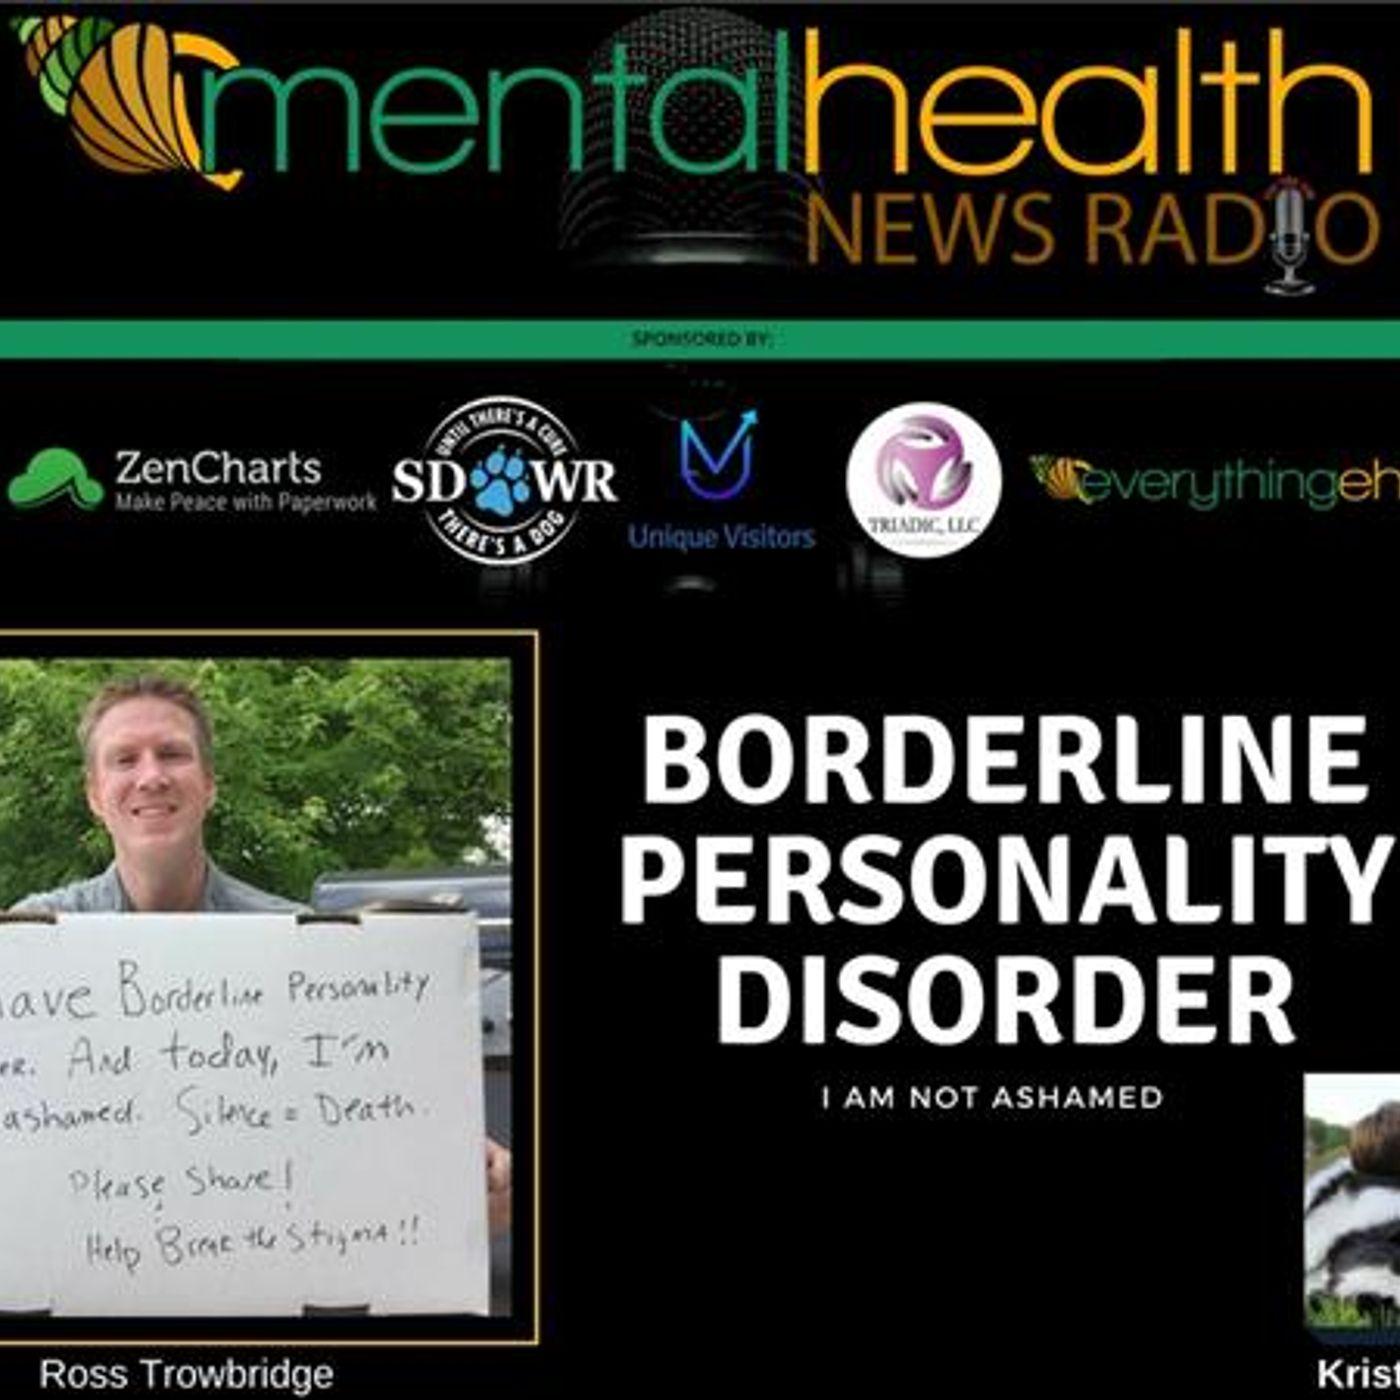 Mental Health News Radio - Borderline Personality Disorder: I Am Not Ashamed With Ross Trowbridge